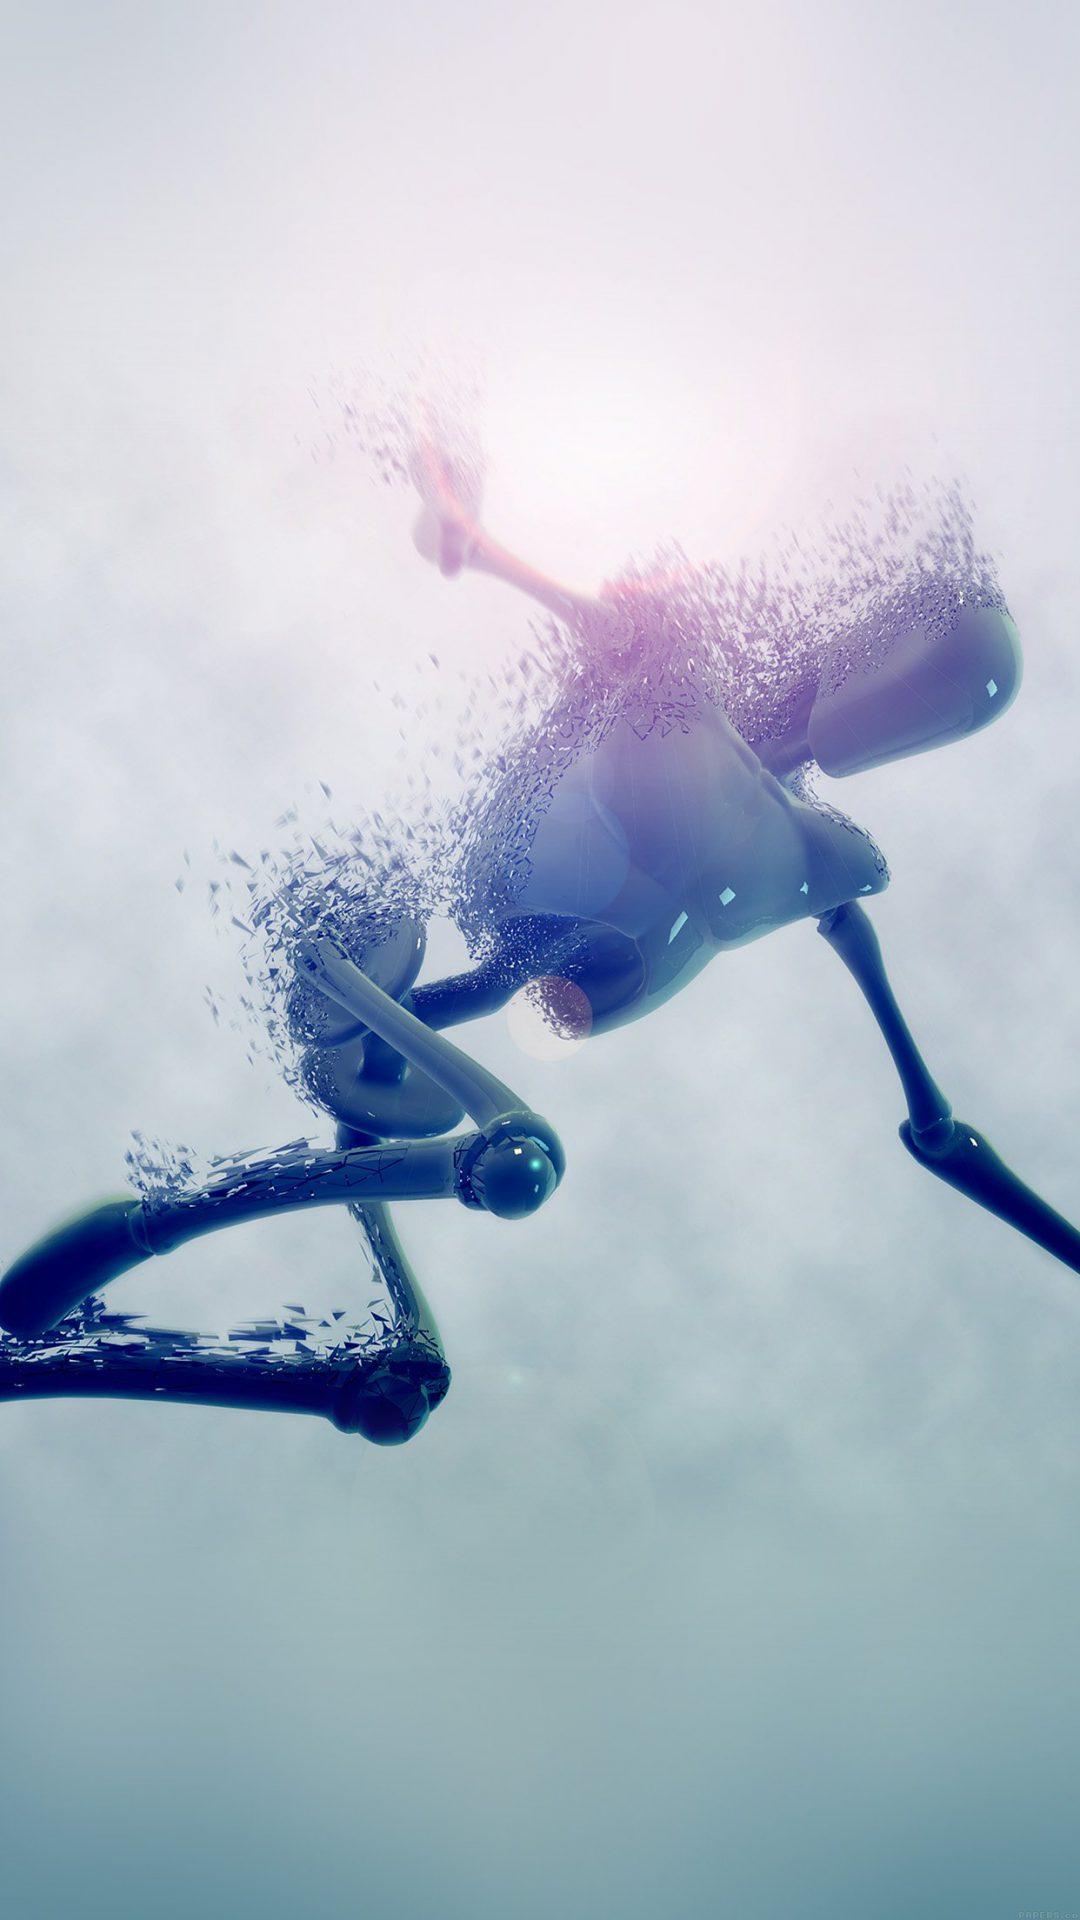 Robot In Water Illust 3d Hd Art